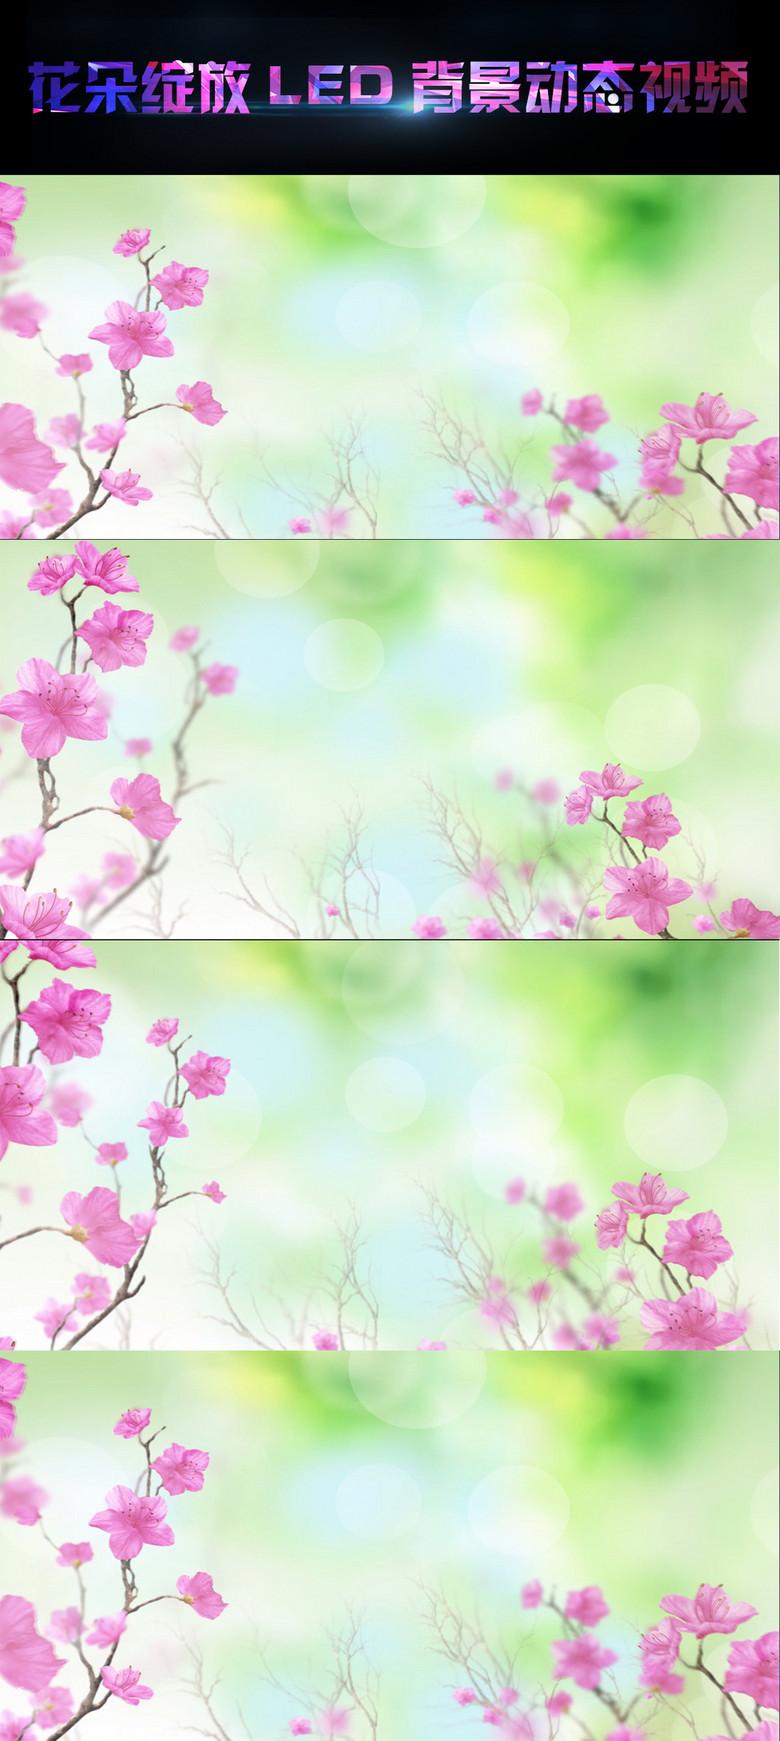 z唯美婚庆花瓣飘落led动态视频素材图片